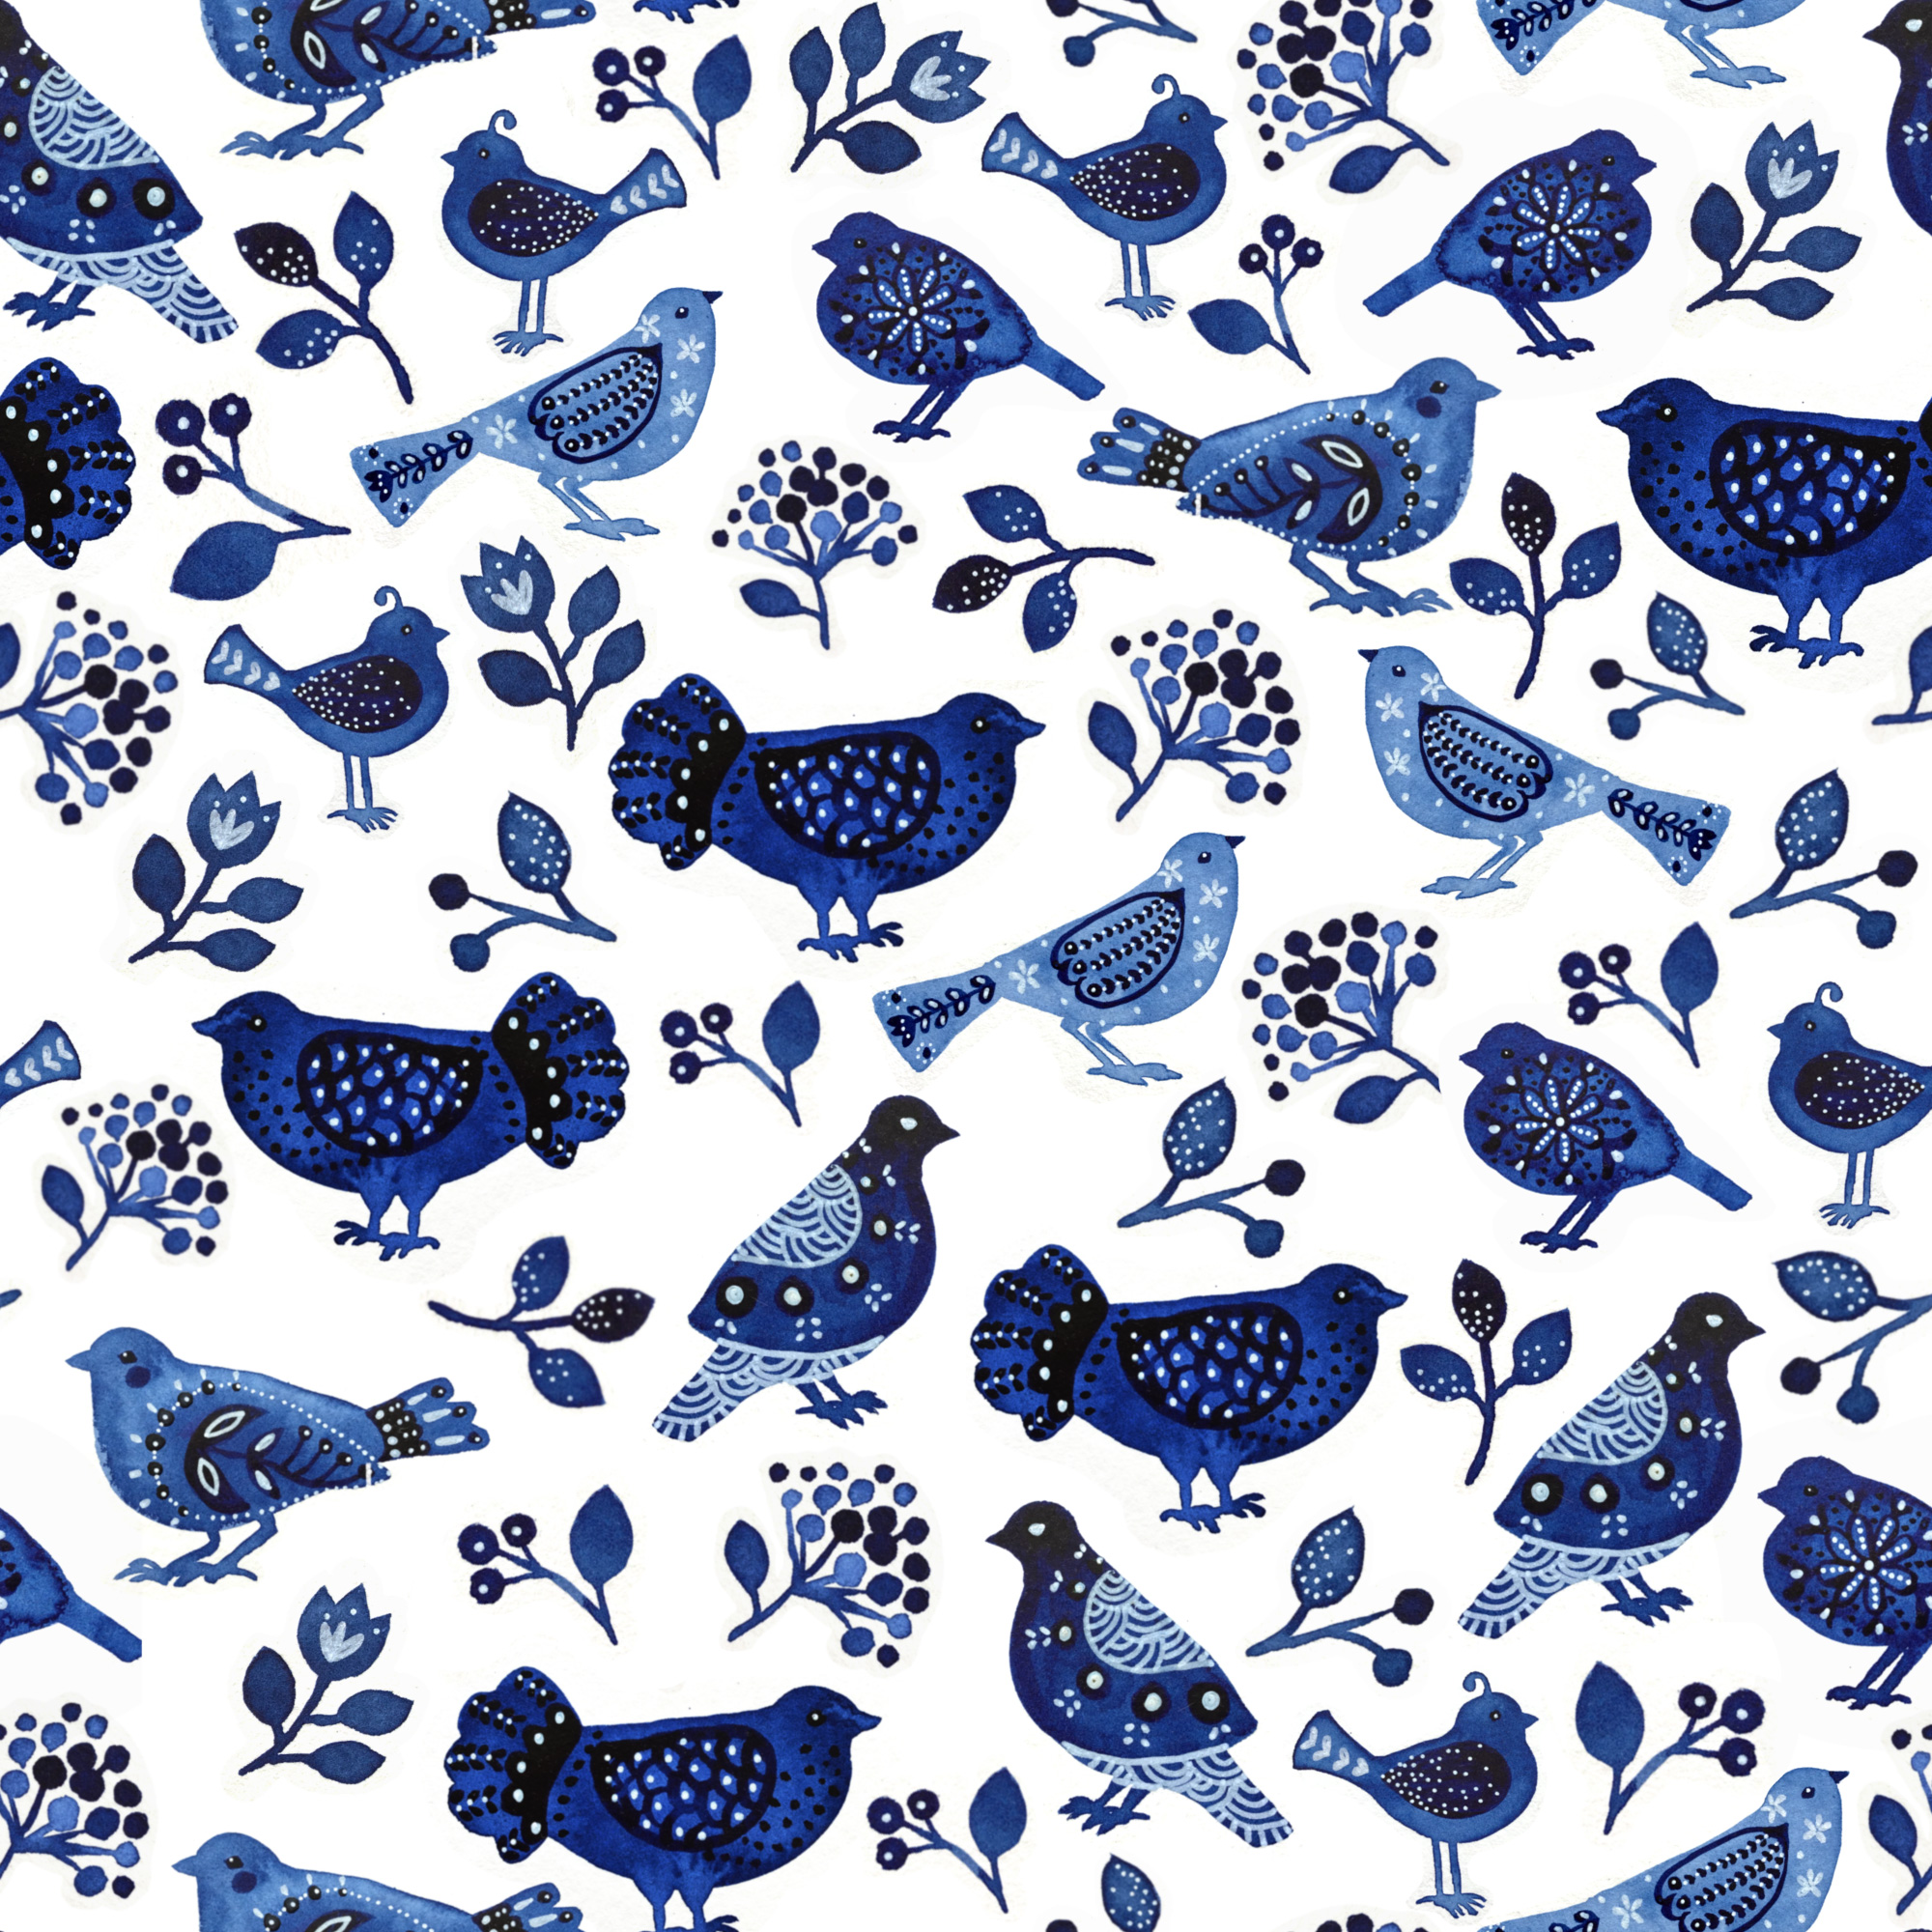 Birds-pattern01.jpg